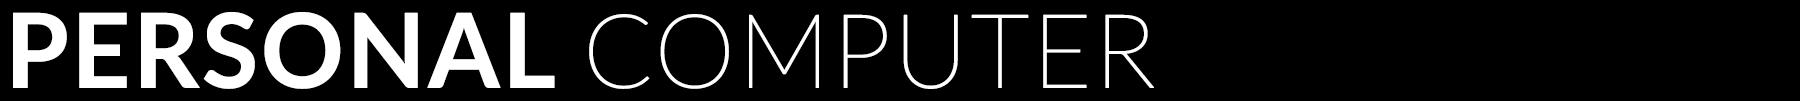 Buy PC Games - Steam, Origin, Battlenet